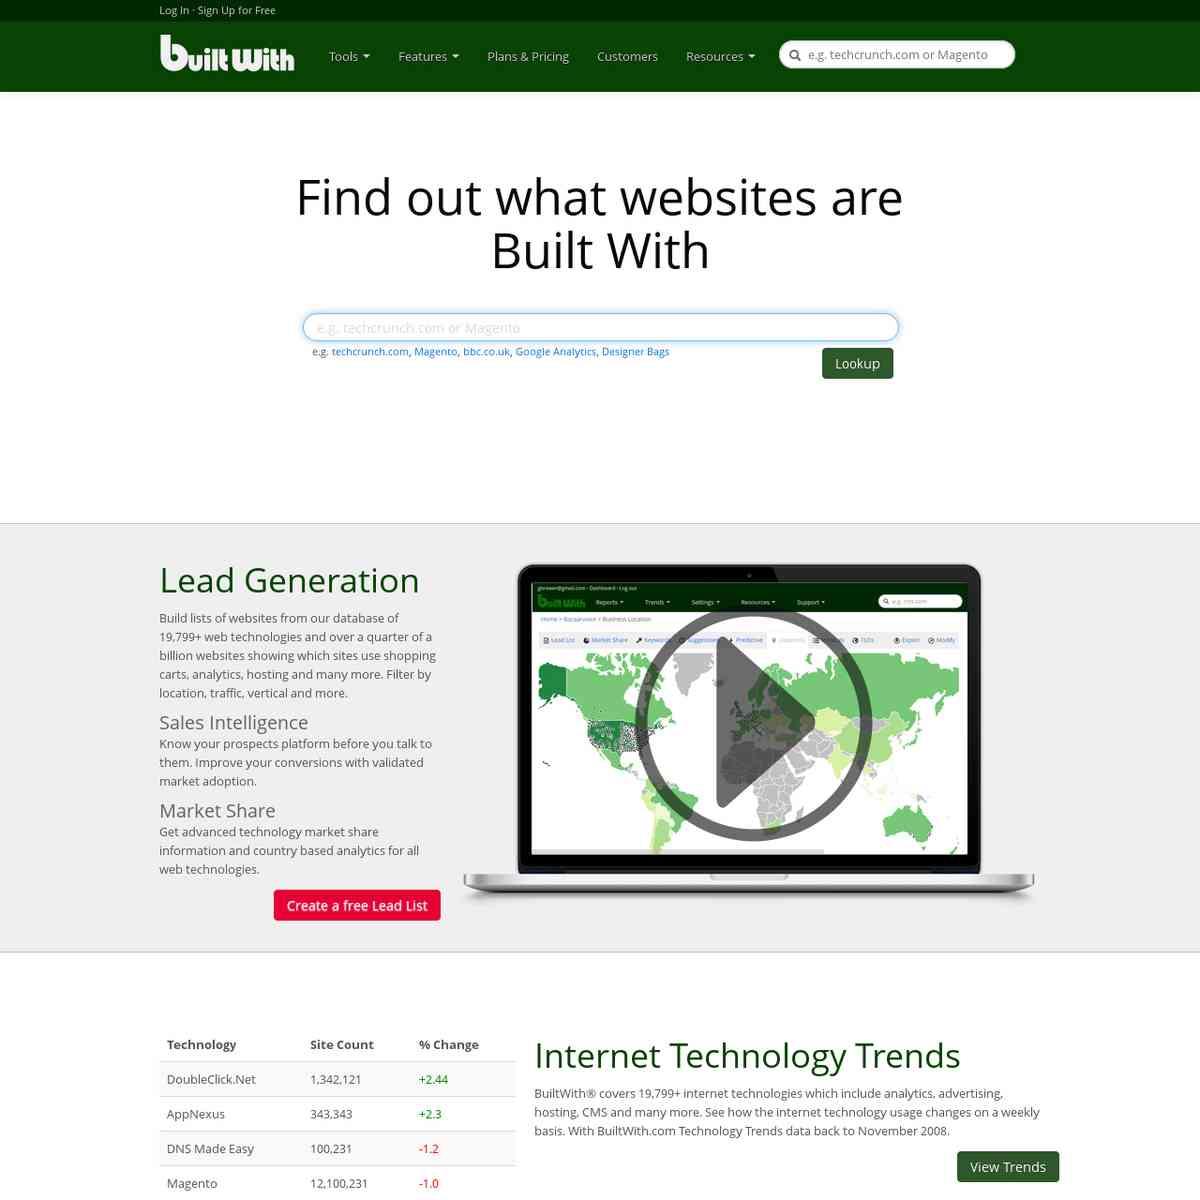 builtwith.com